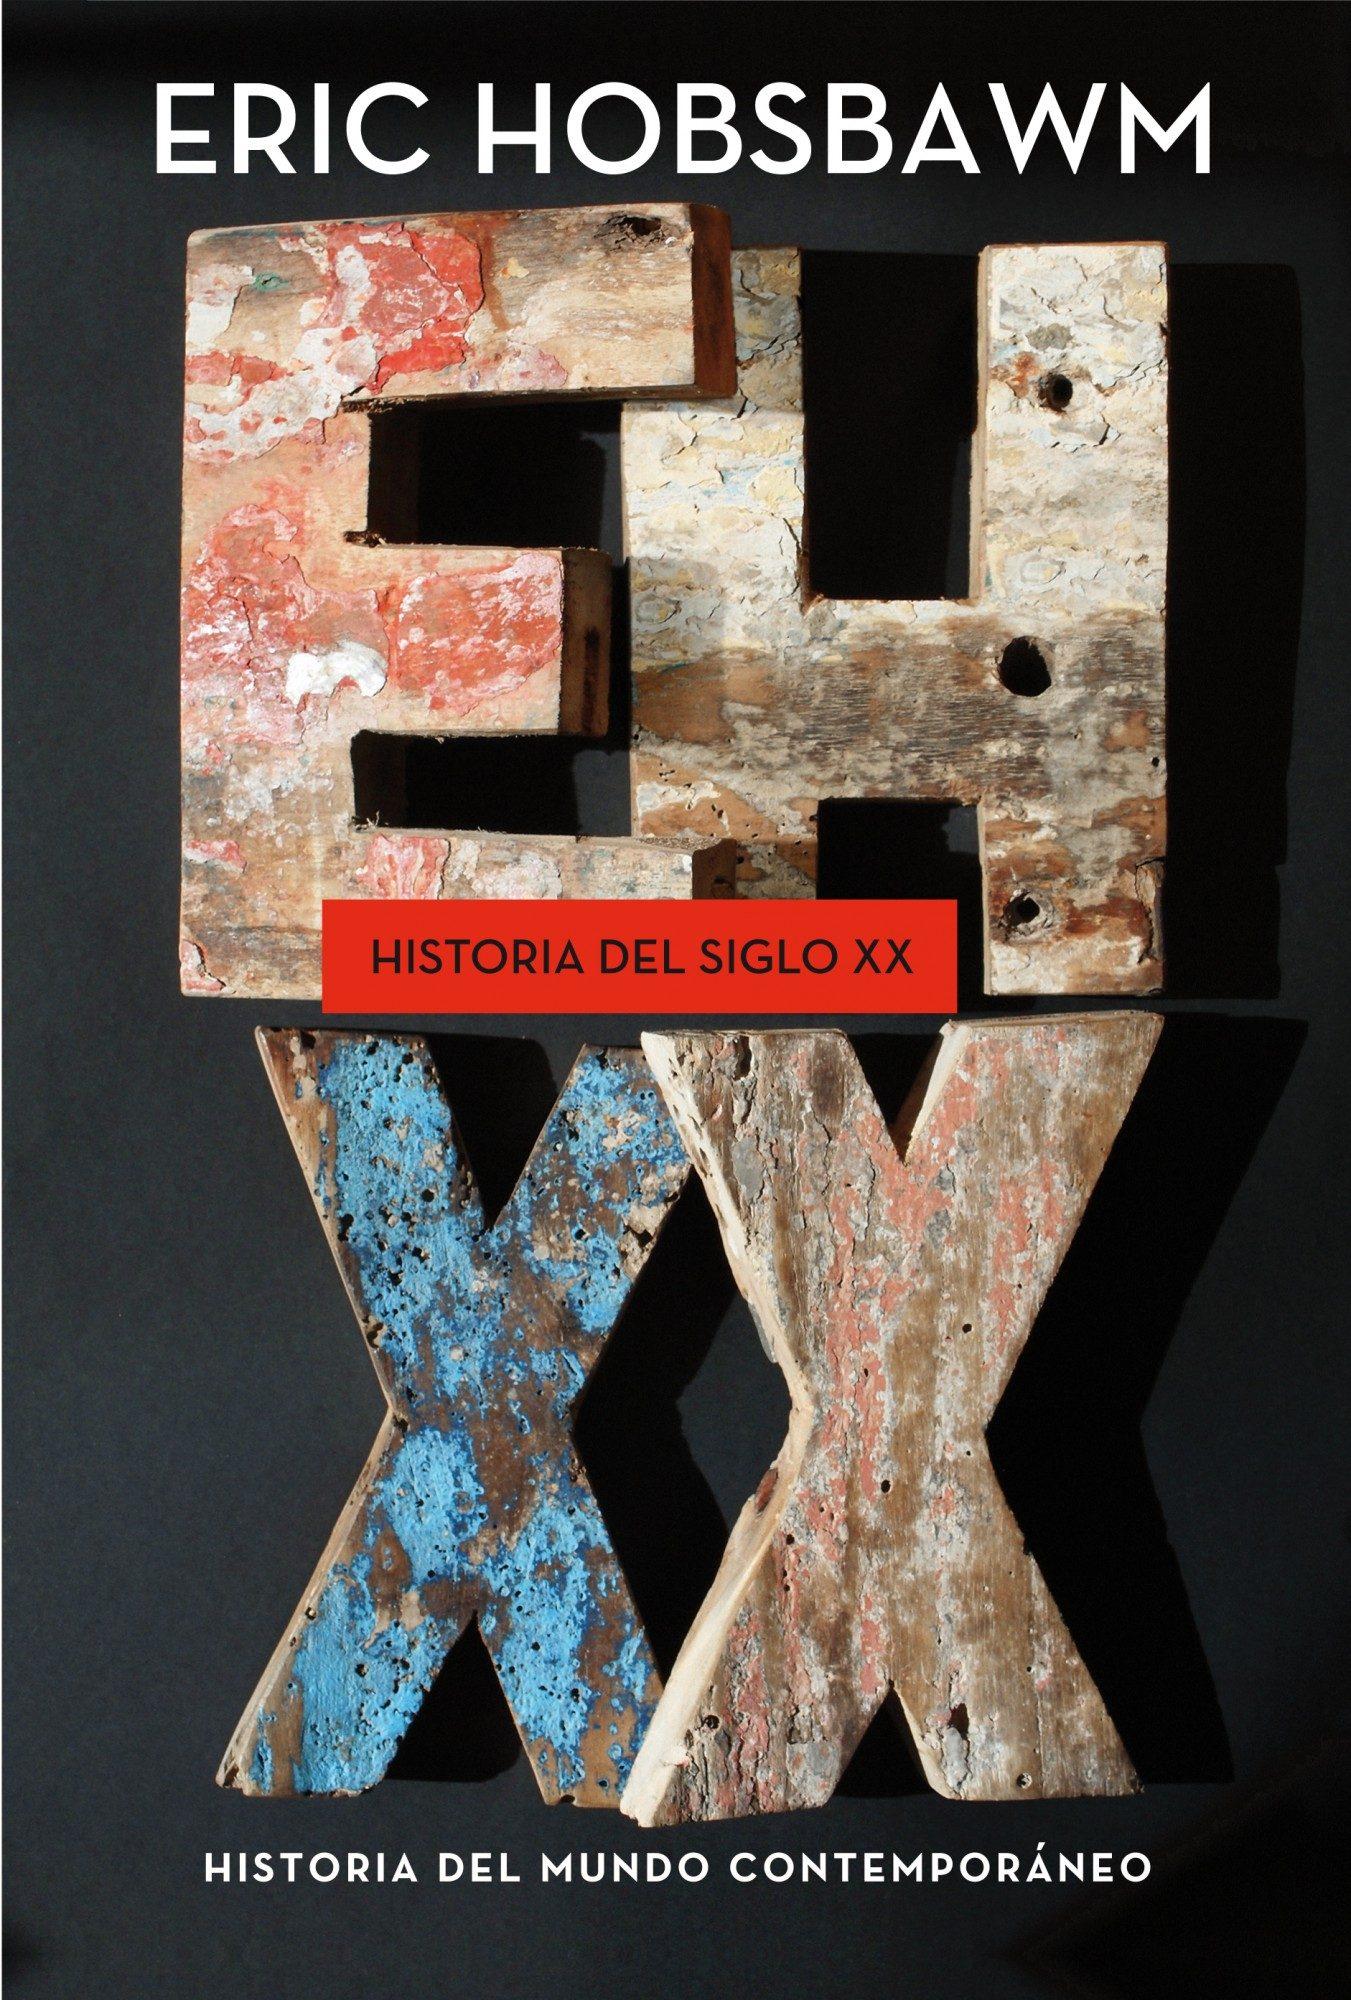 Hobsbawm, Eric J.,  Historia del siglo XX. Historia del mundo contemporáneo,  Editorial Crítica, 2014